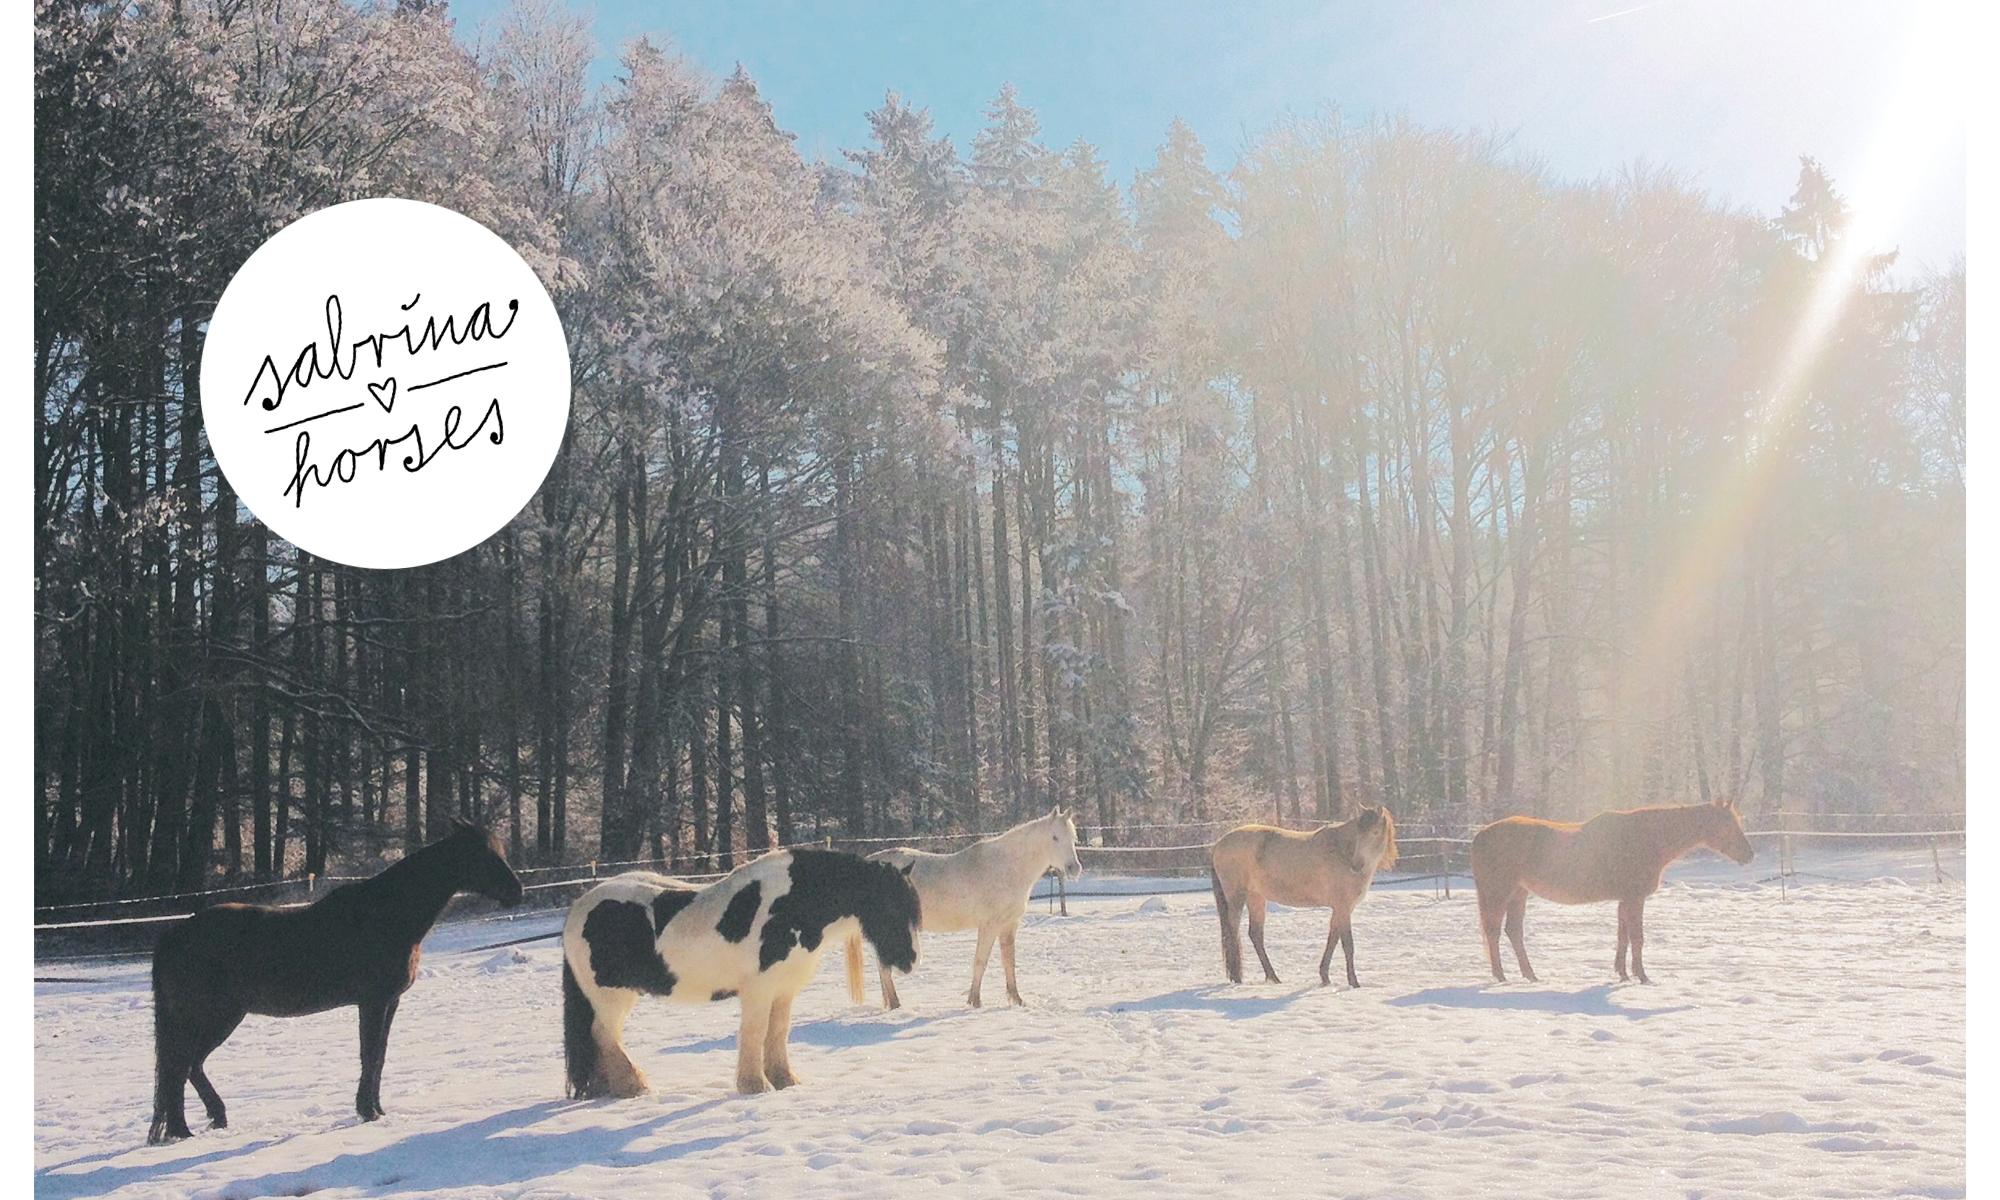 sabrina loves horses